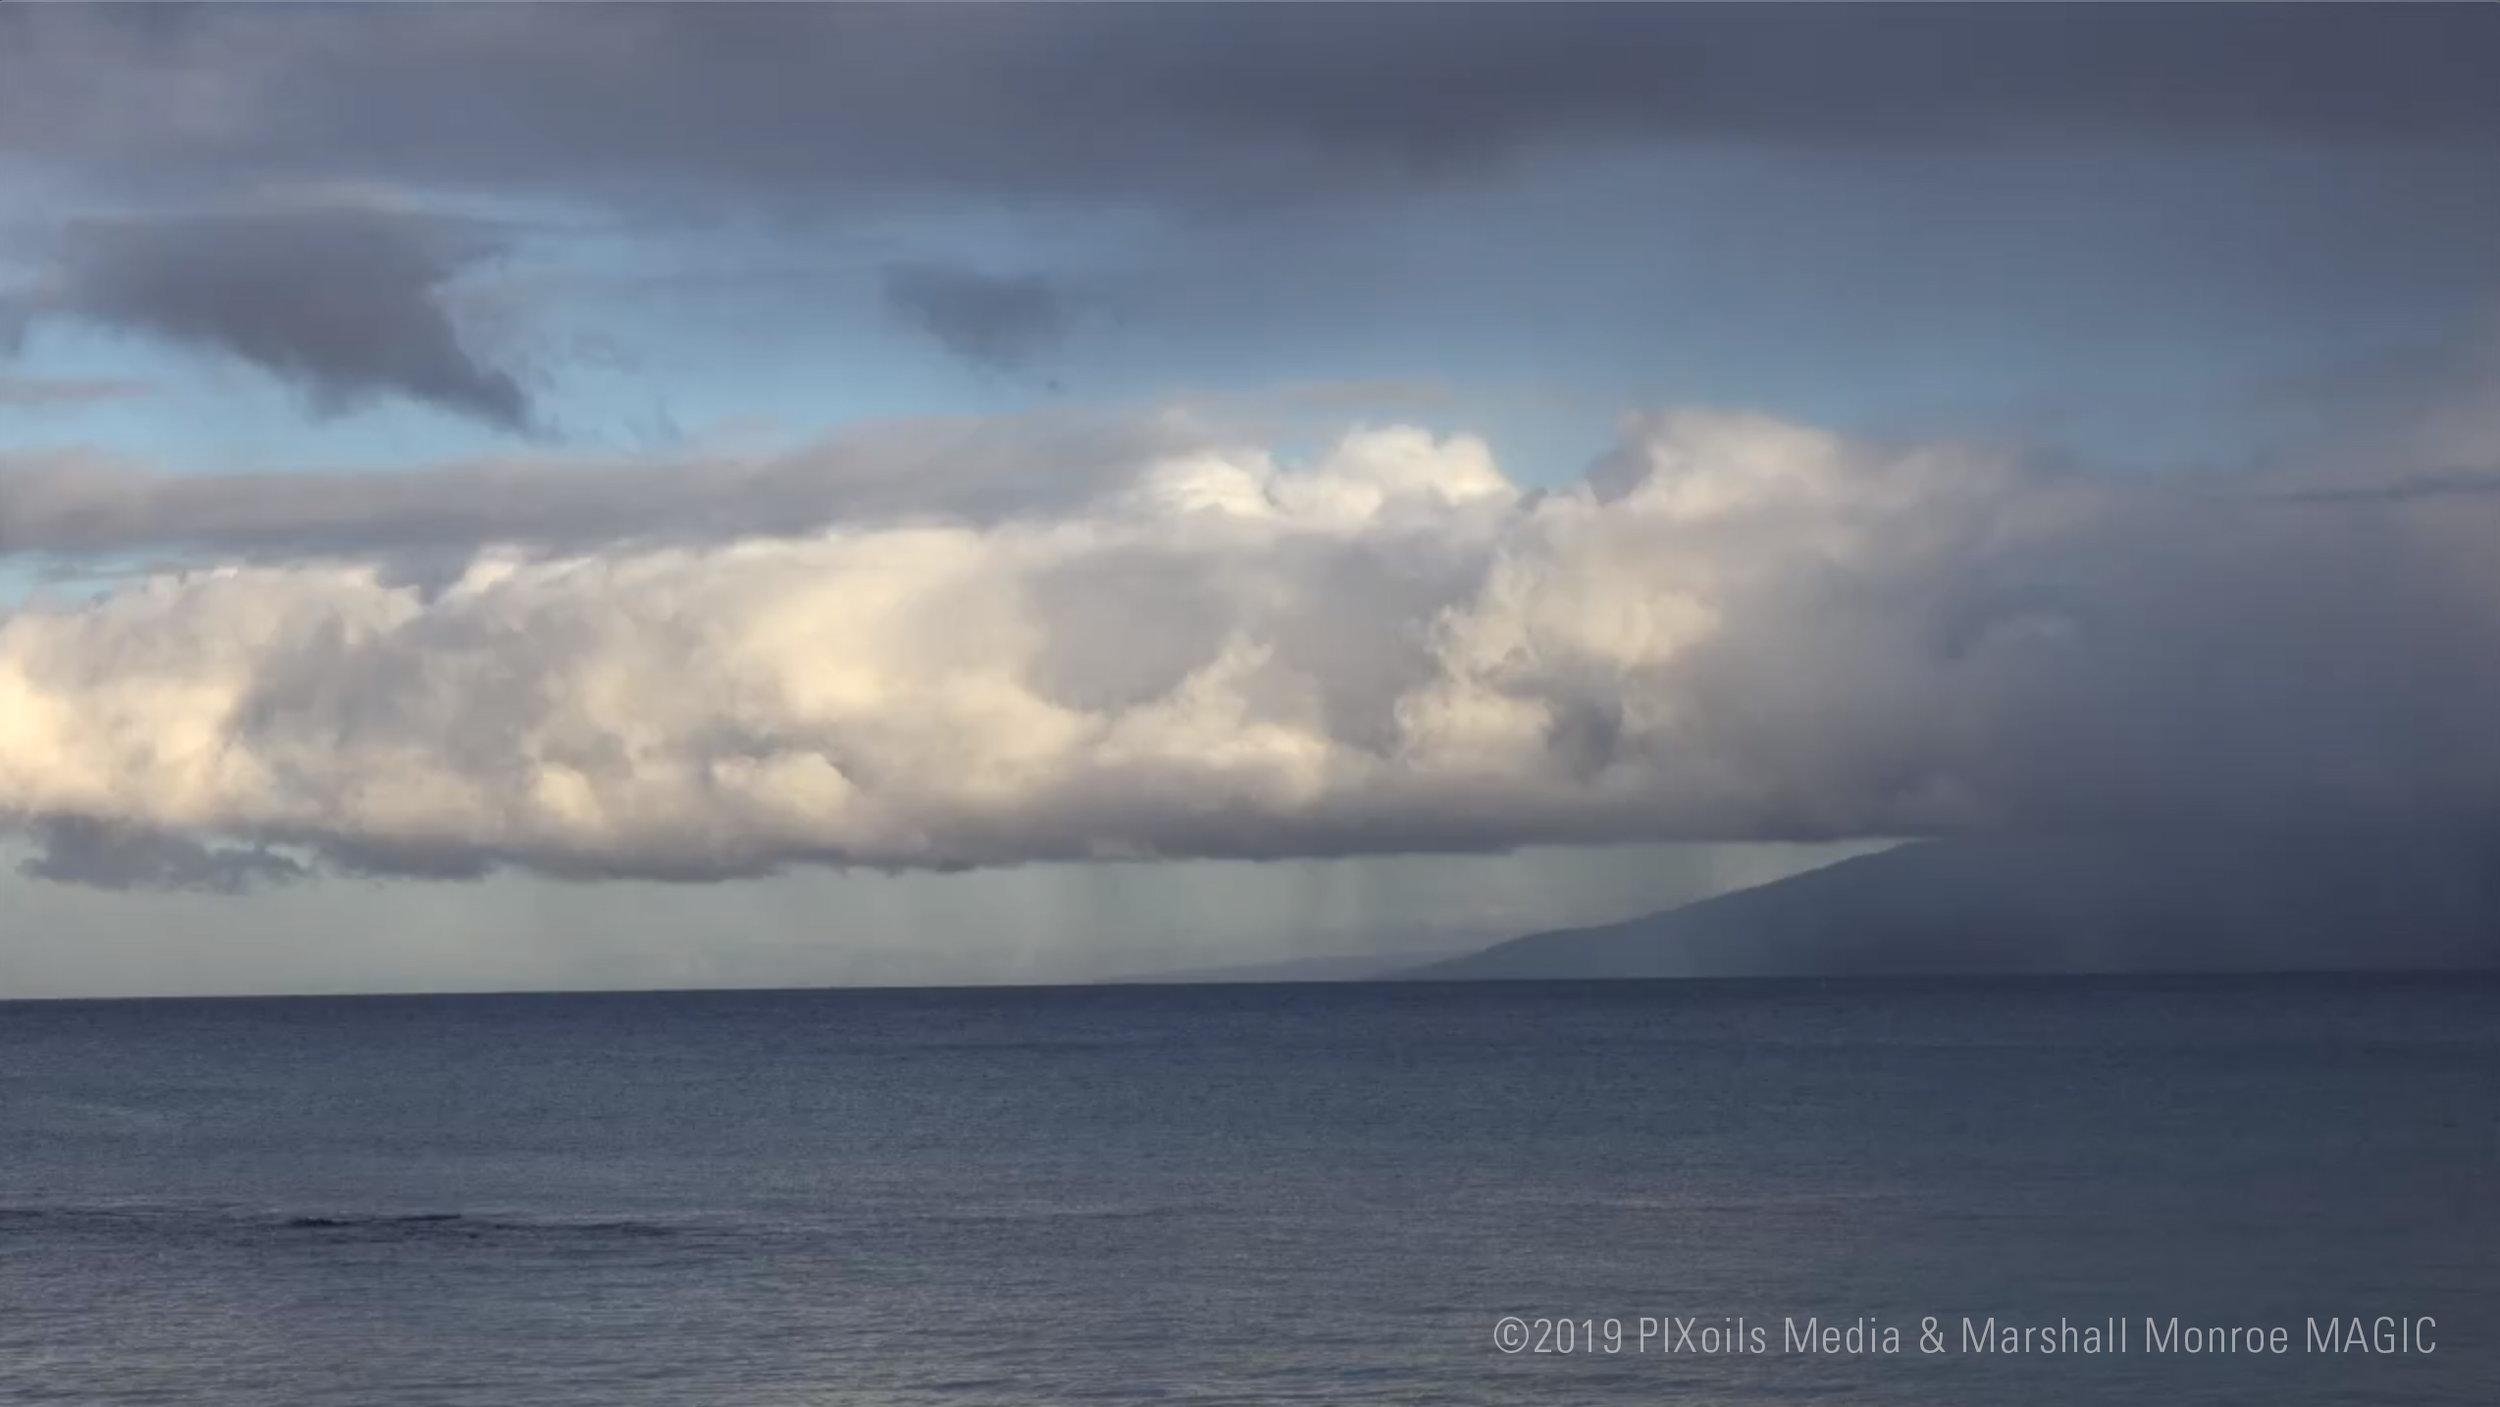 CONSERVATORi Edition Maui-Napili, Marshall Monroe - Storm Over Lanai Sequence